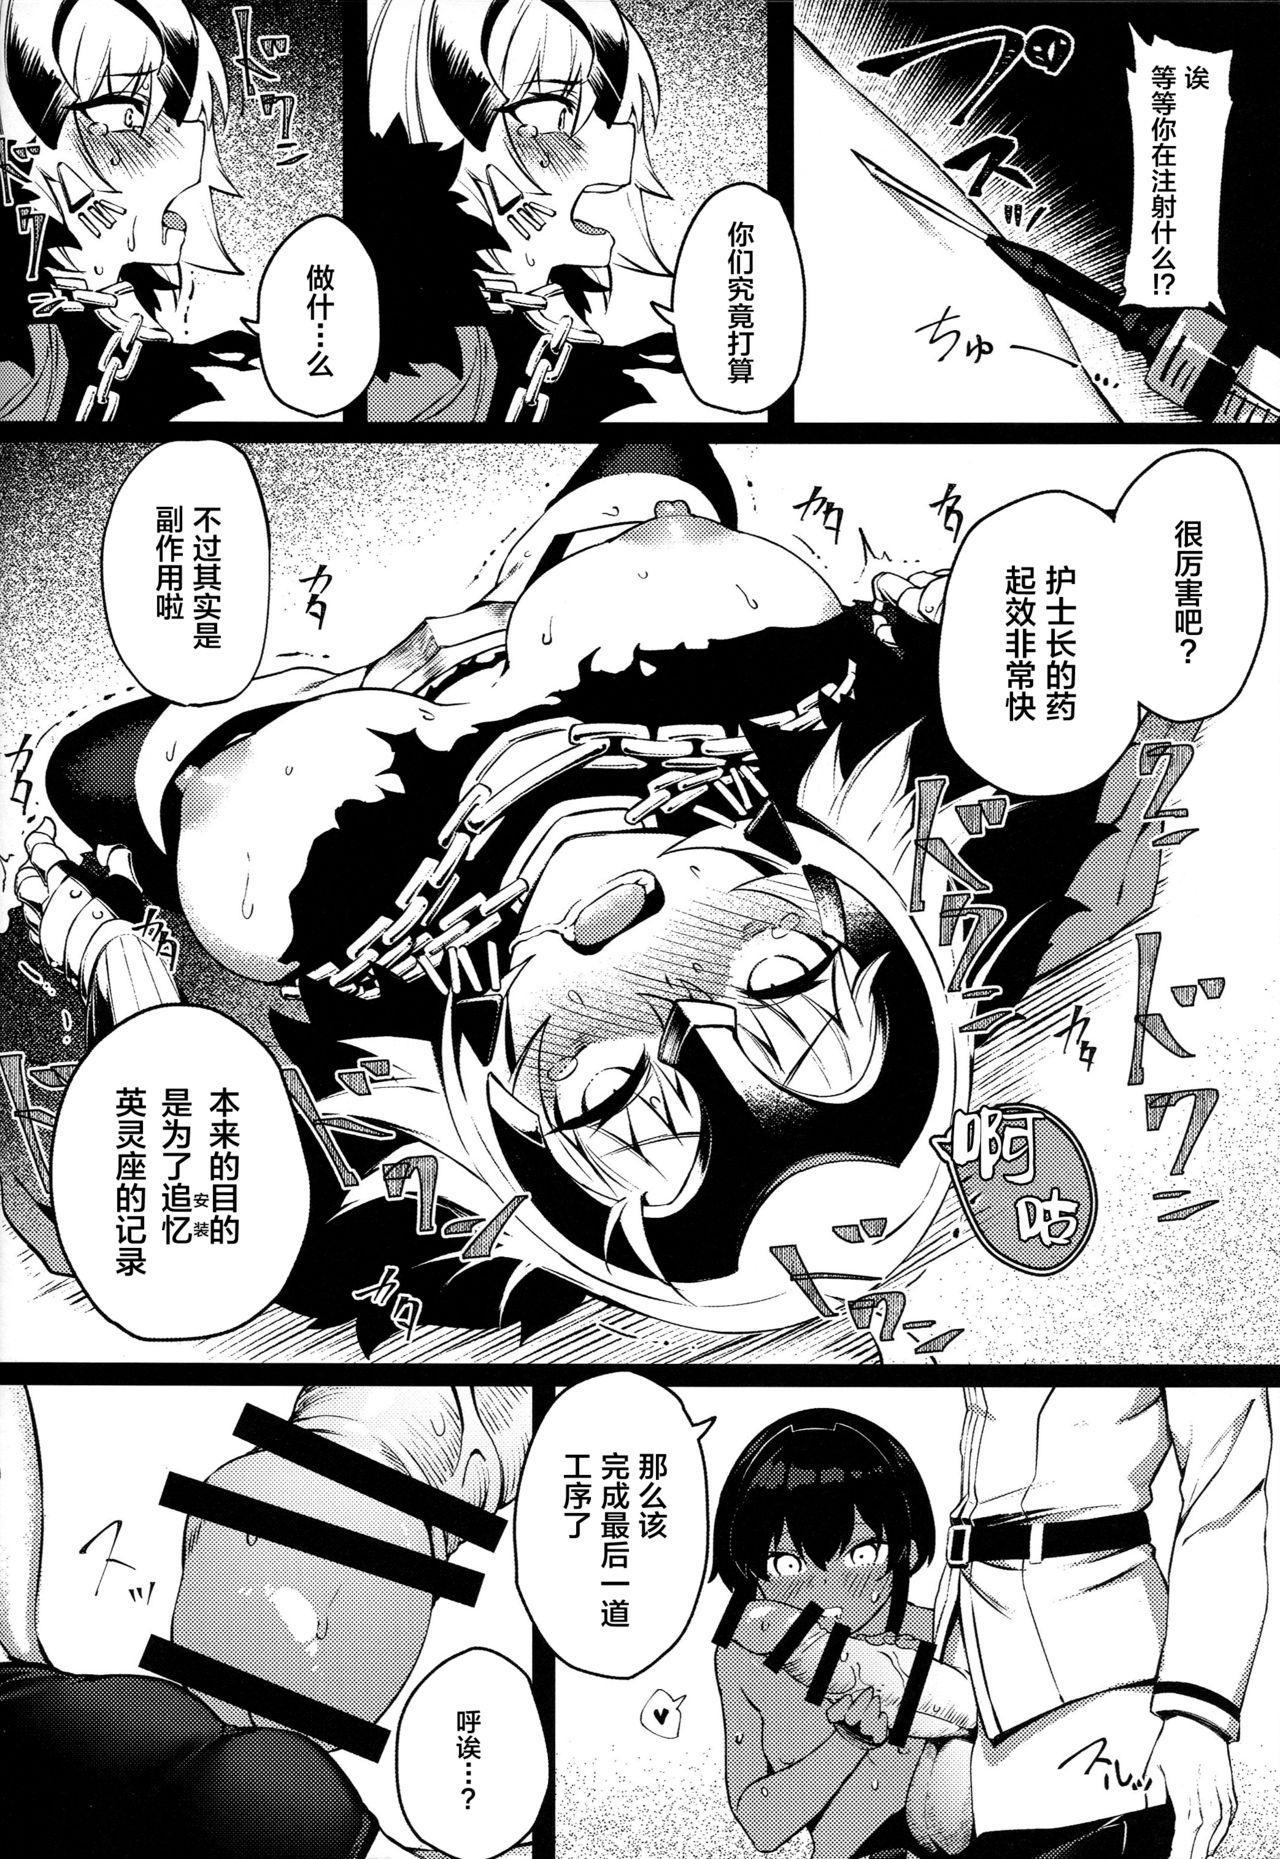 Tensei Jeanne Master Chinpo de Mashou Ochi 6